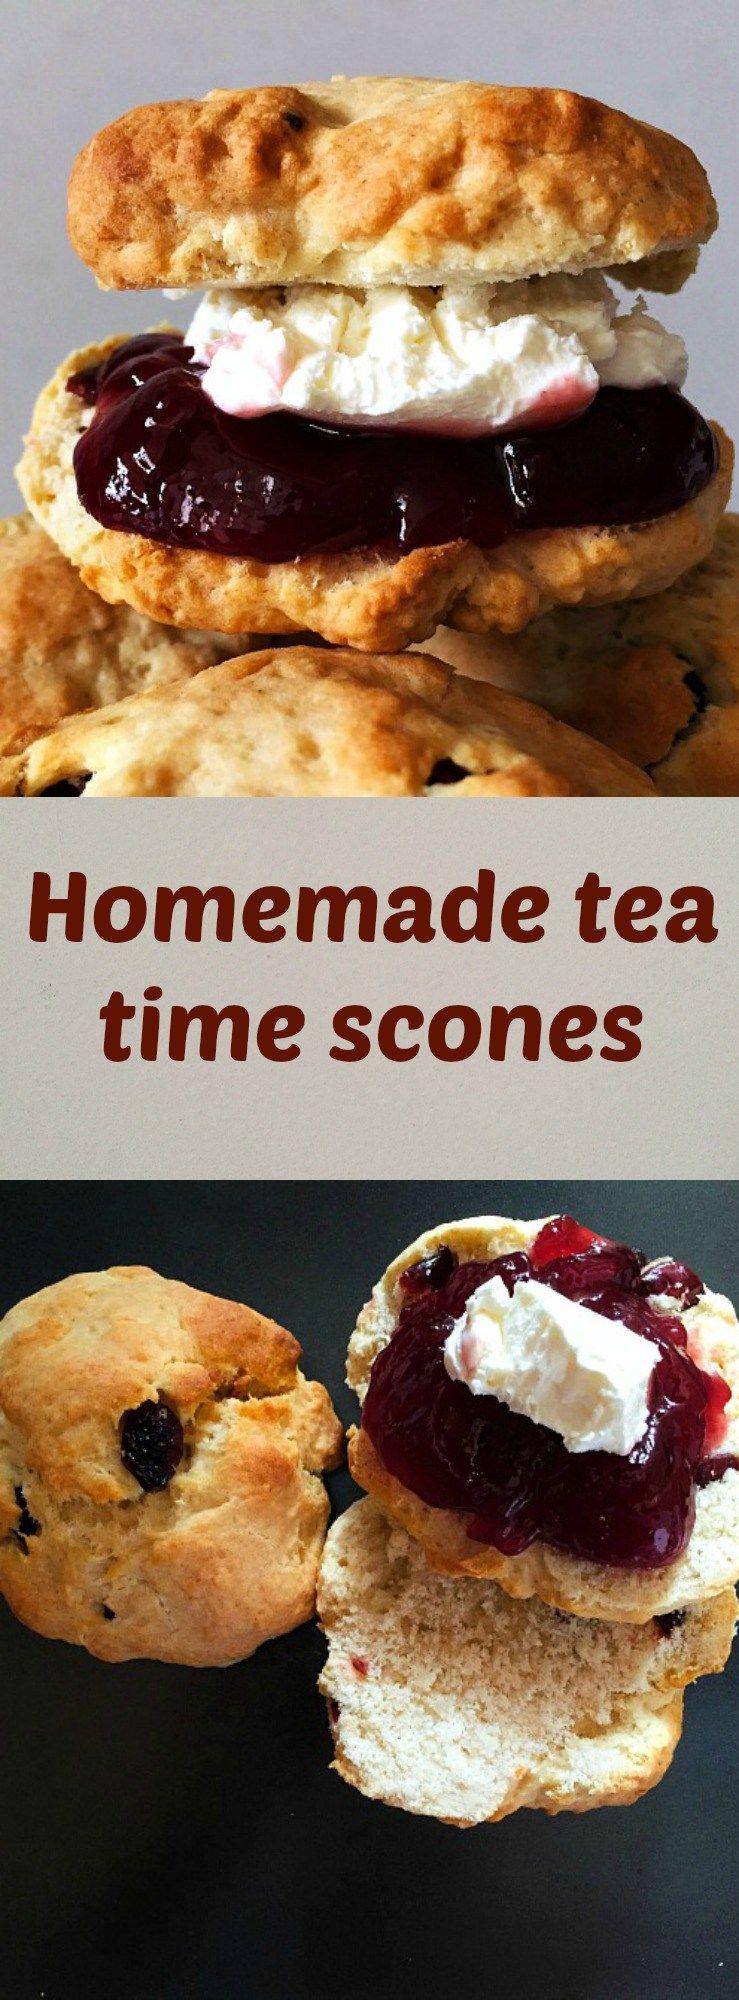 Homemade tea time scones a true british delish recipe